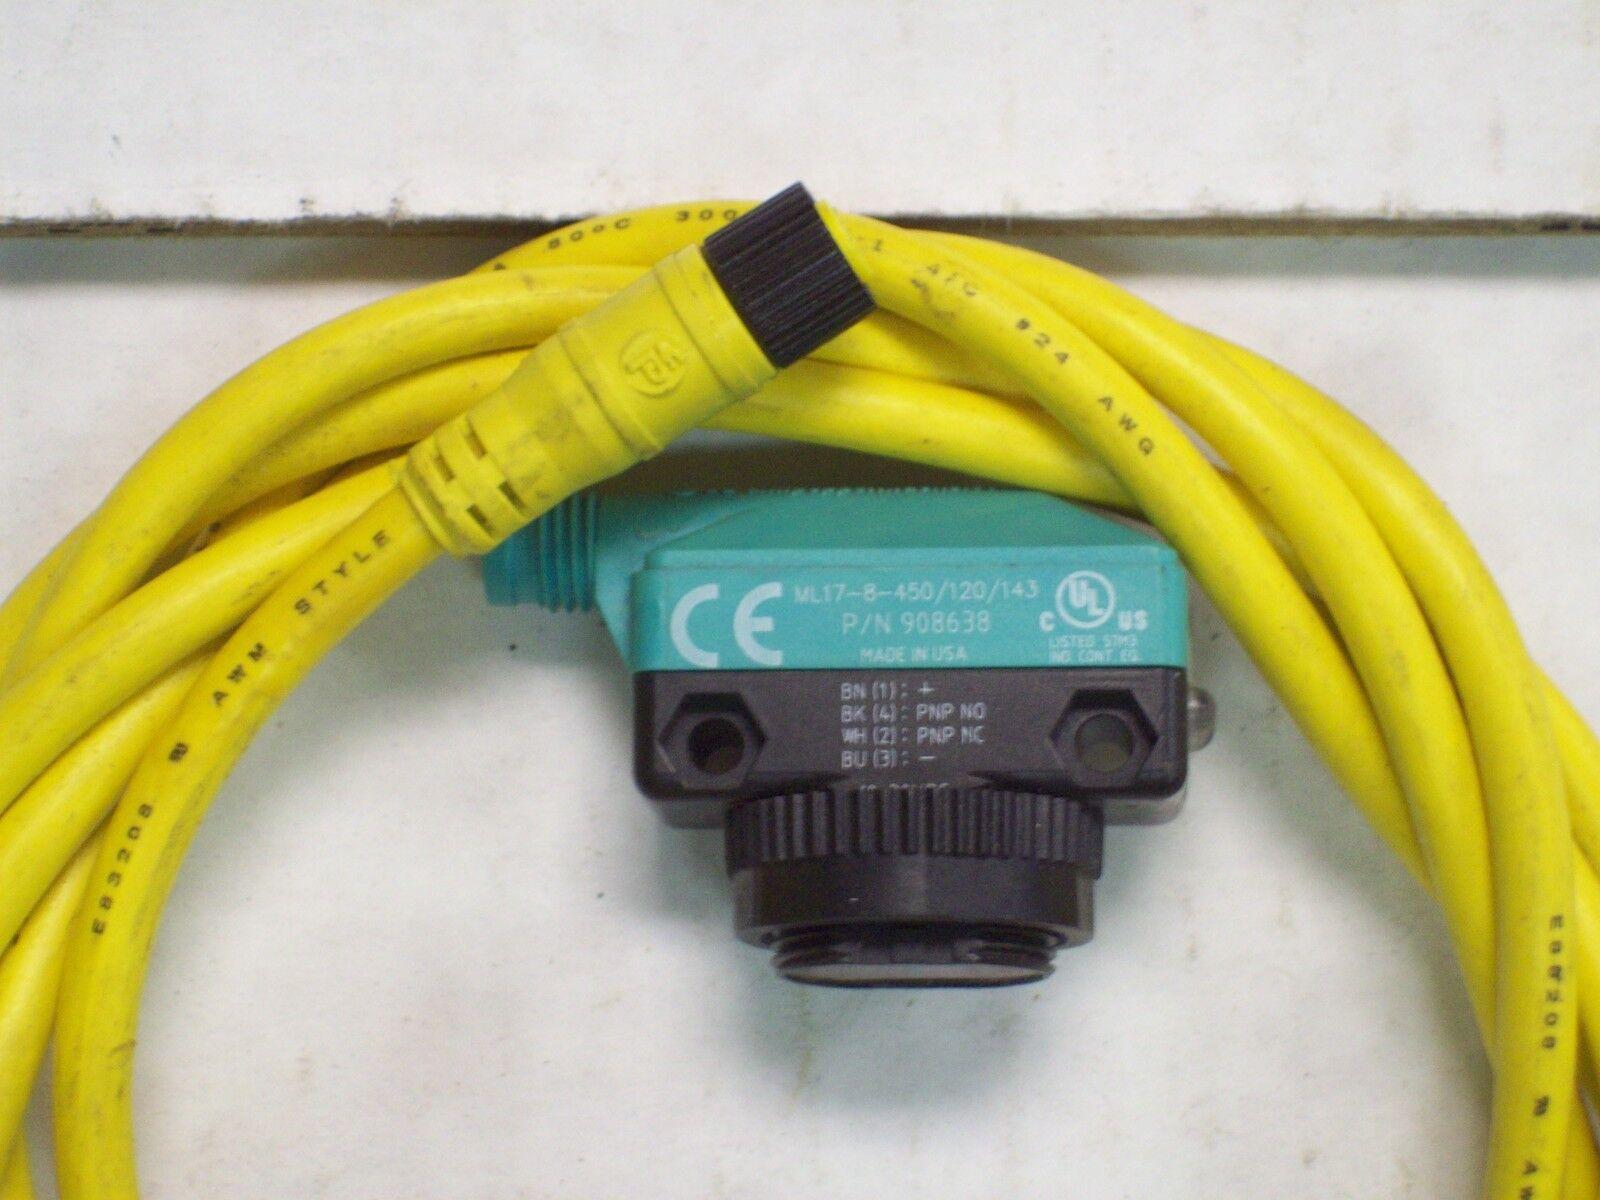 Pepperl    Fuchs Fotoeléctrica Sensor ML17-8-450/120/143 w Cable V31-GM-YE2M-PVC 12c5df